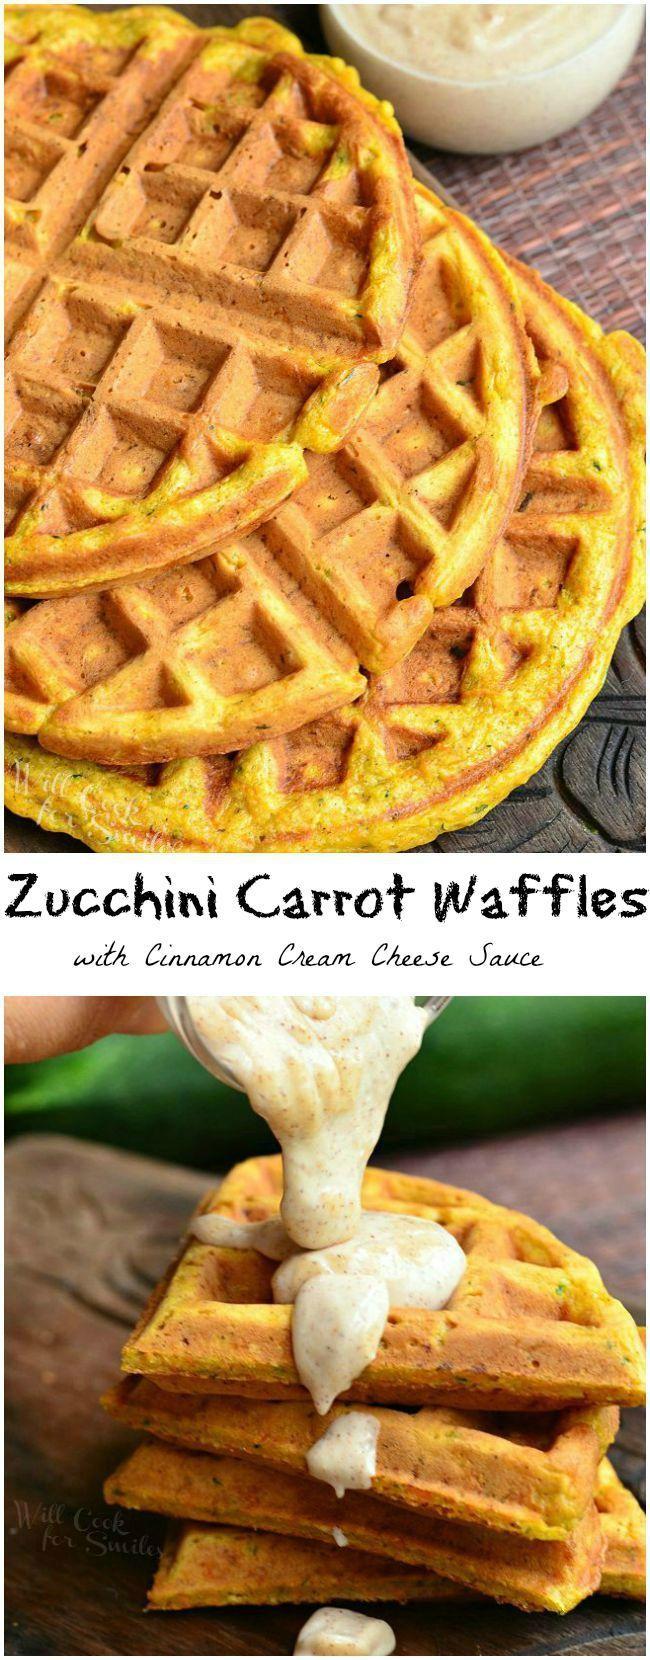 Zucchini Carrot Waffles with Cinnamon Cream Cheese Sauce